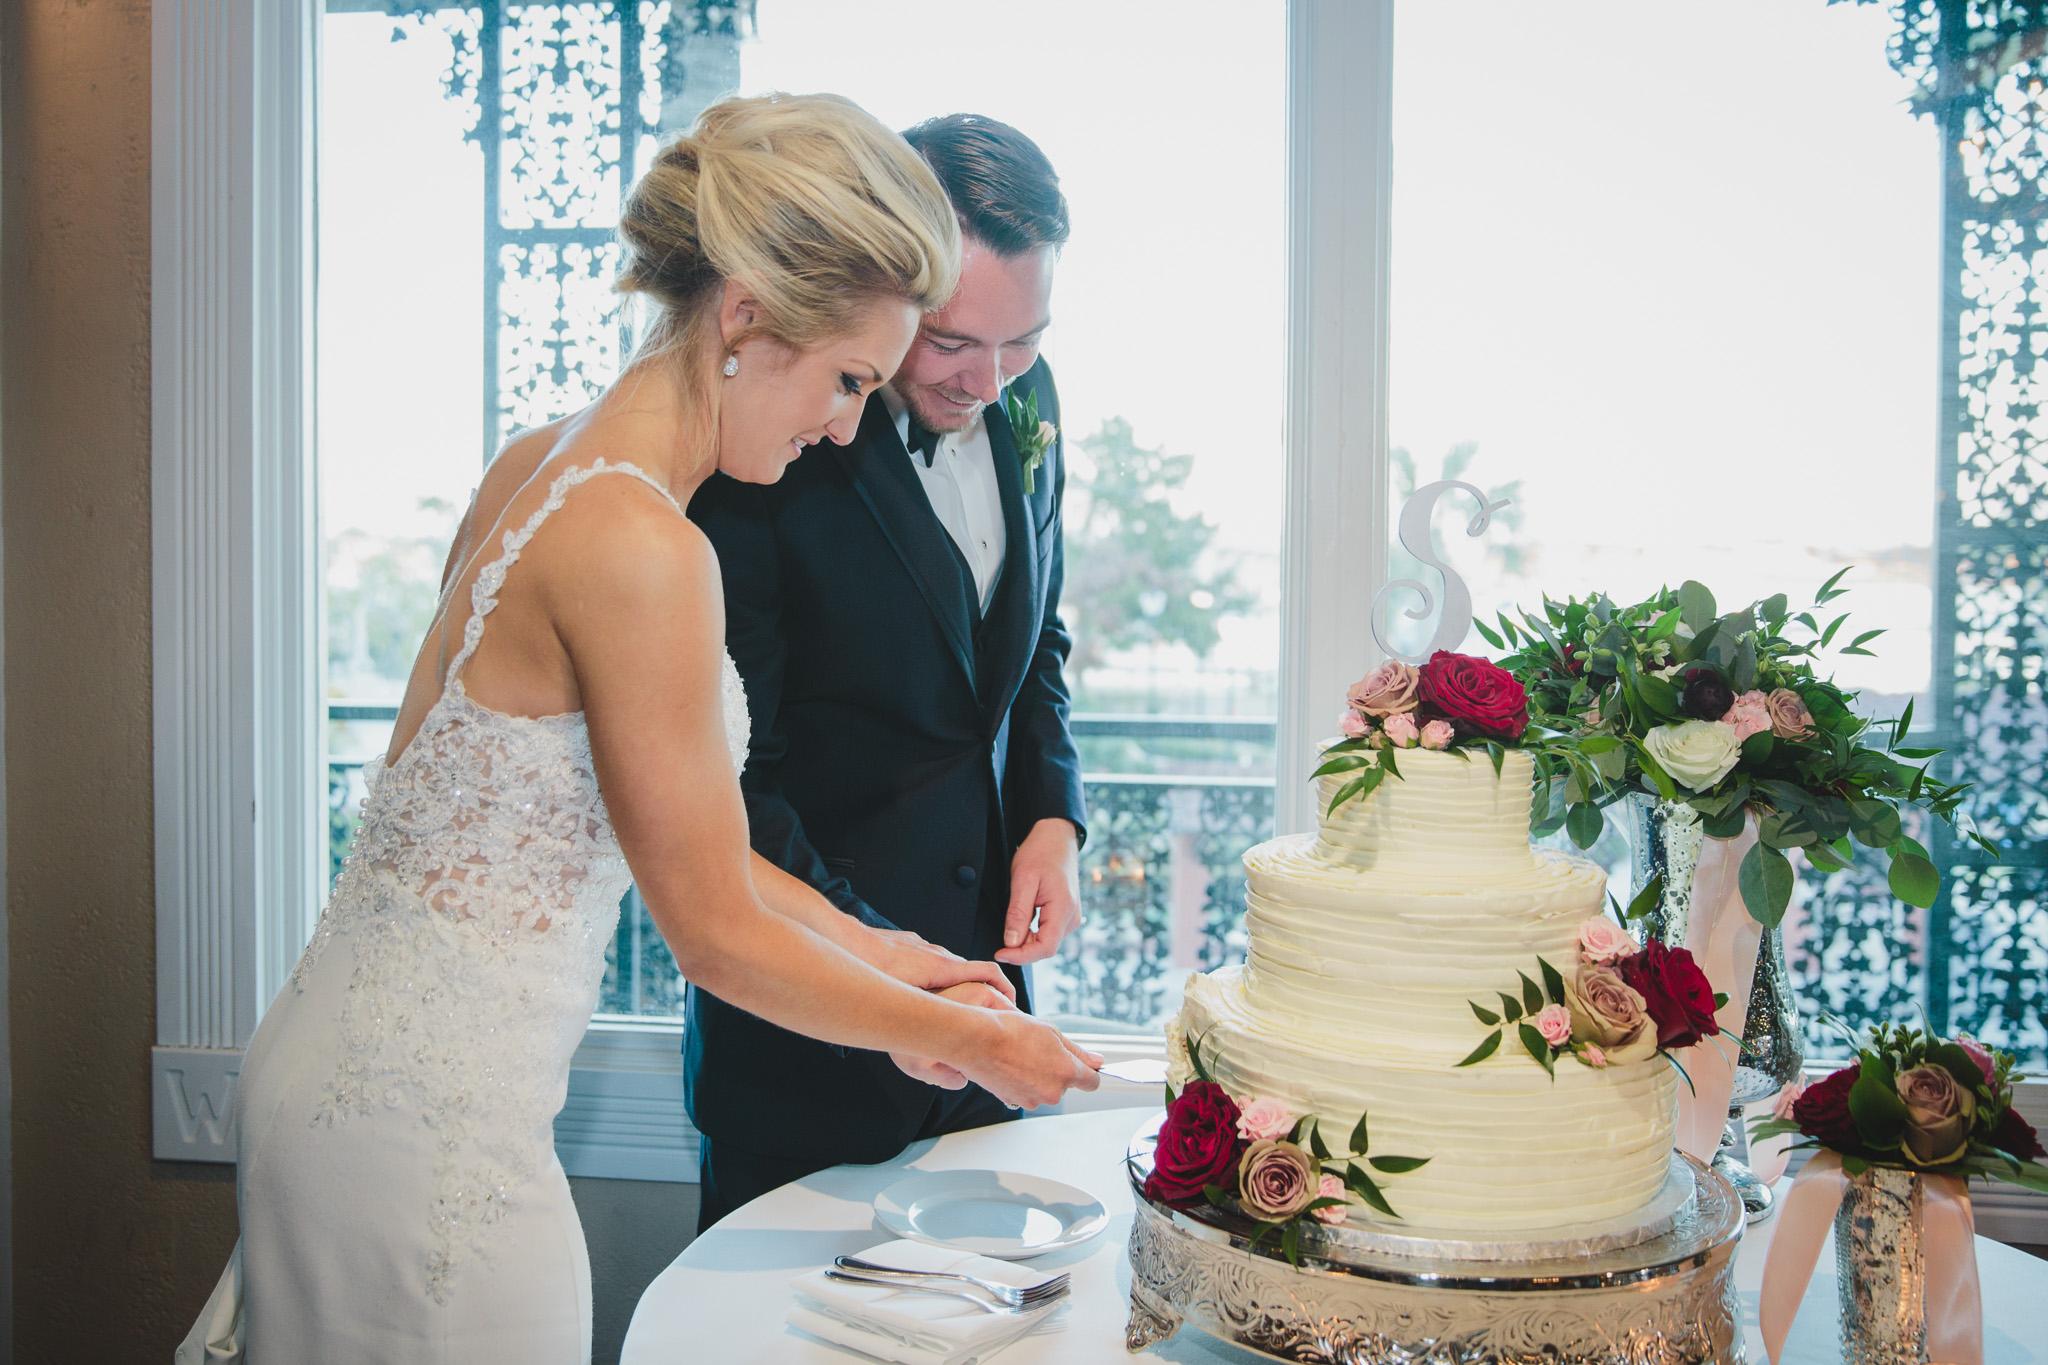 st-augustine-florida-wedding-venue-white-room-reception